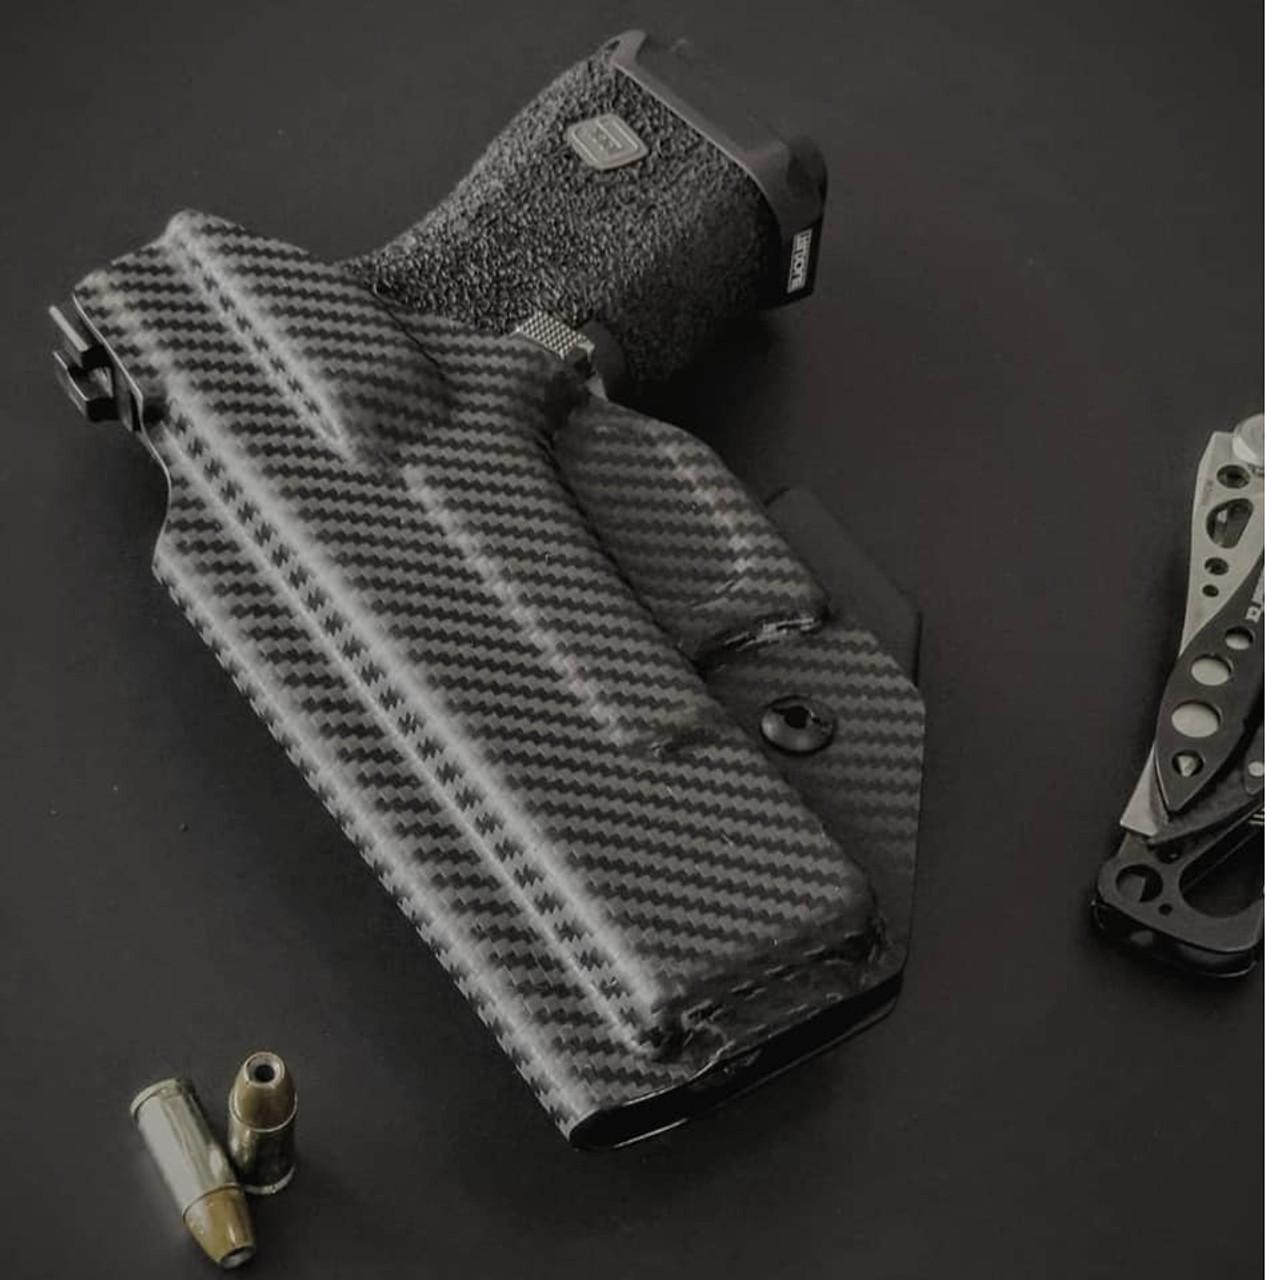 Glock 19 Carbon Fiber Appendix Carry Kydex Holster